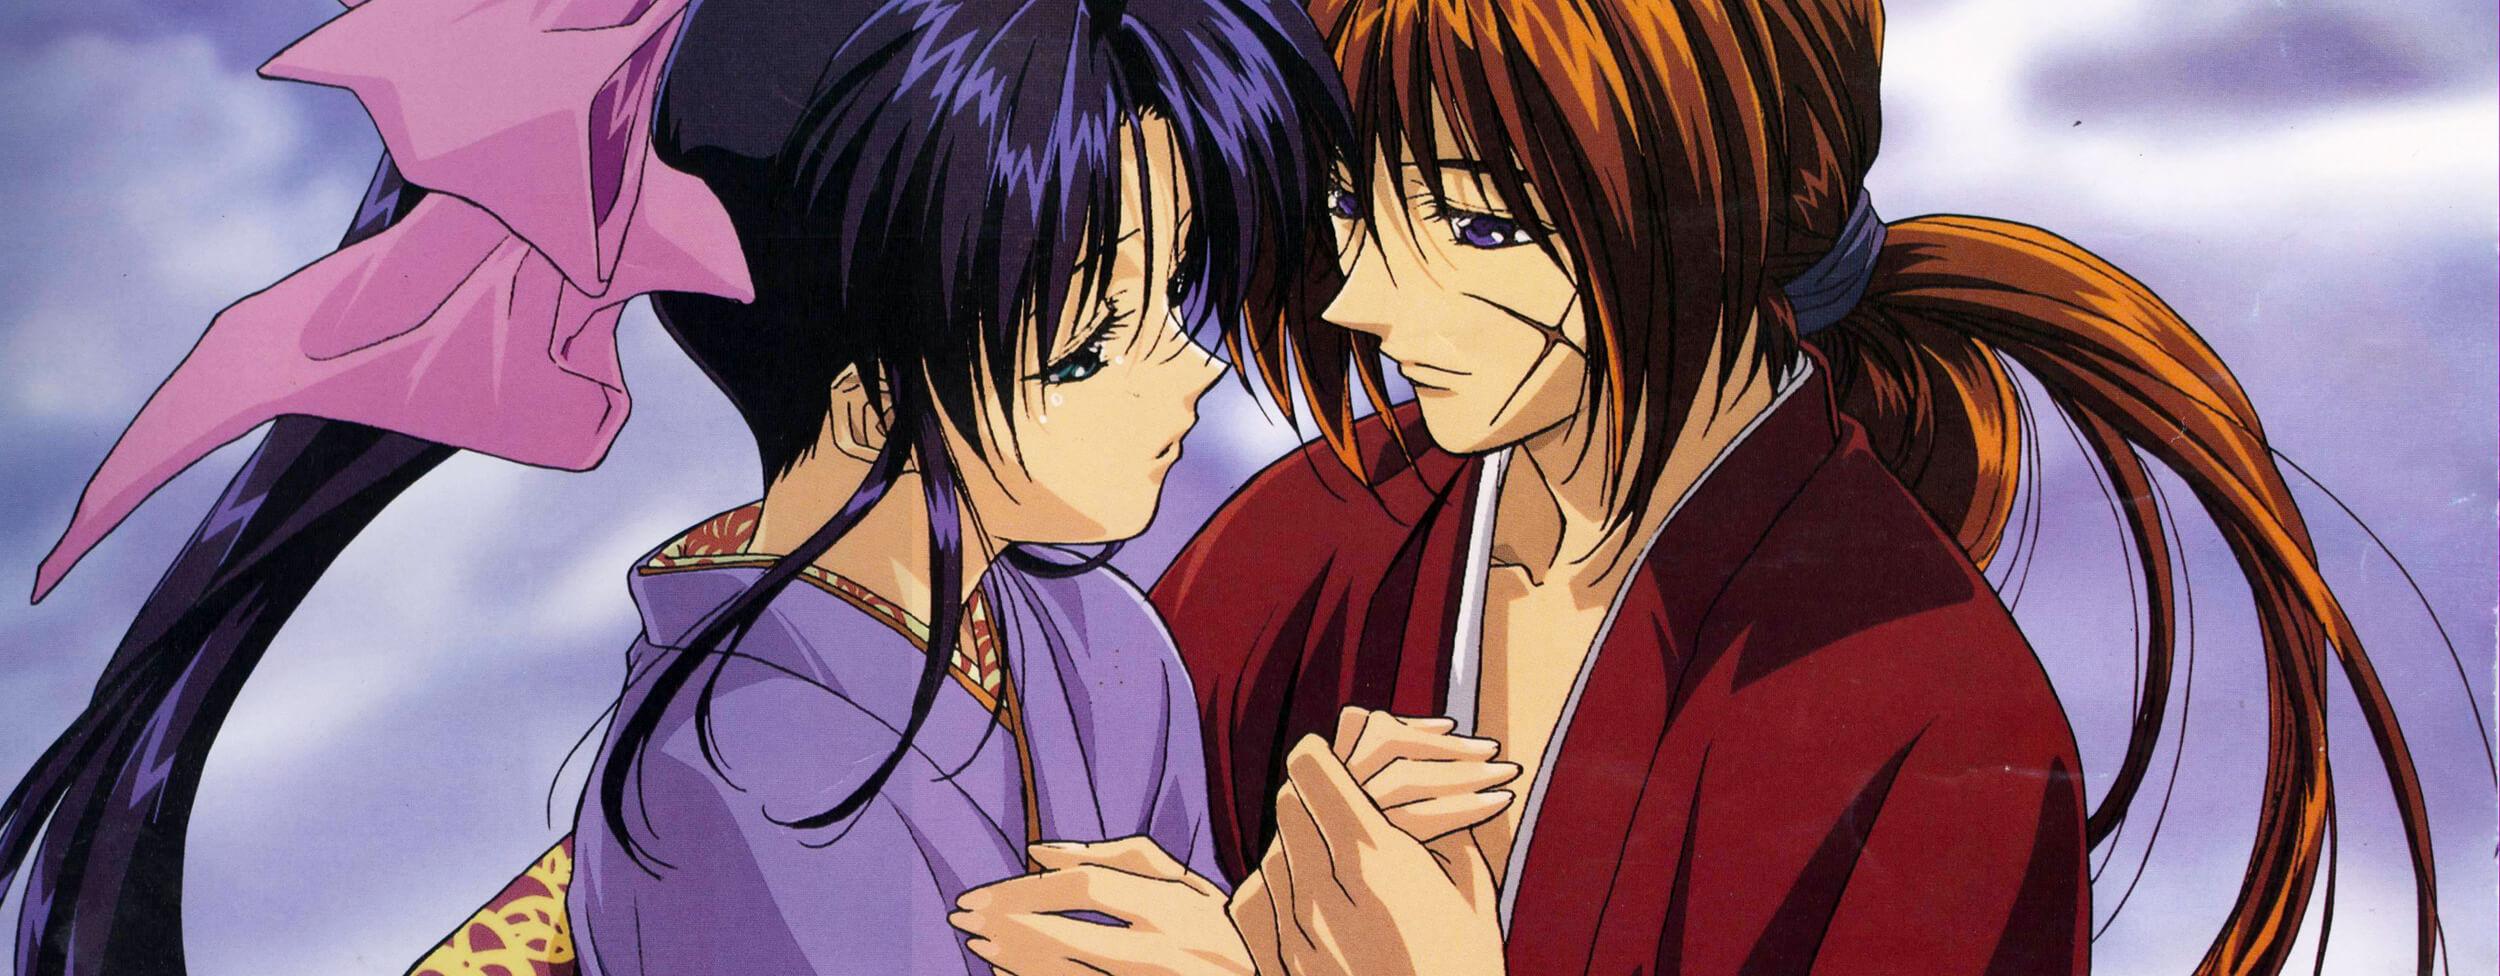 When Your Favorite Anime Sucks » Yatta-Tachi